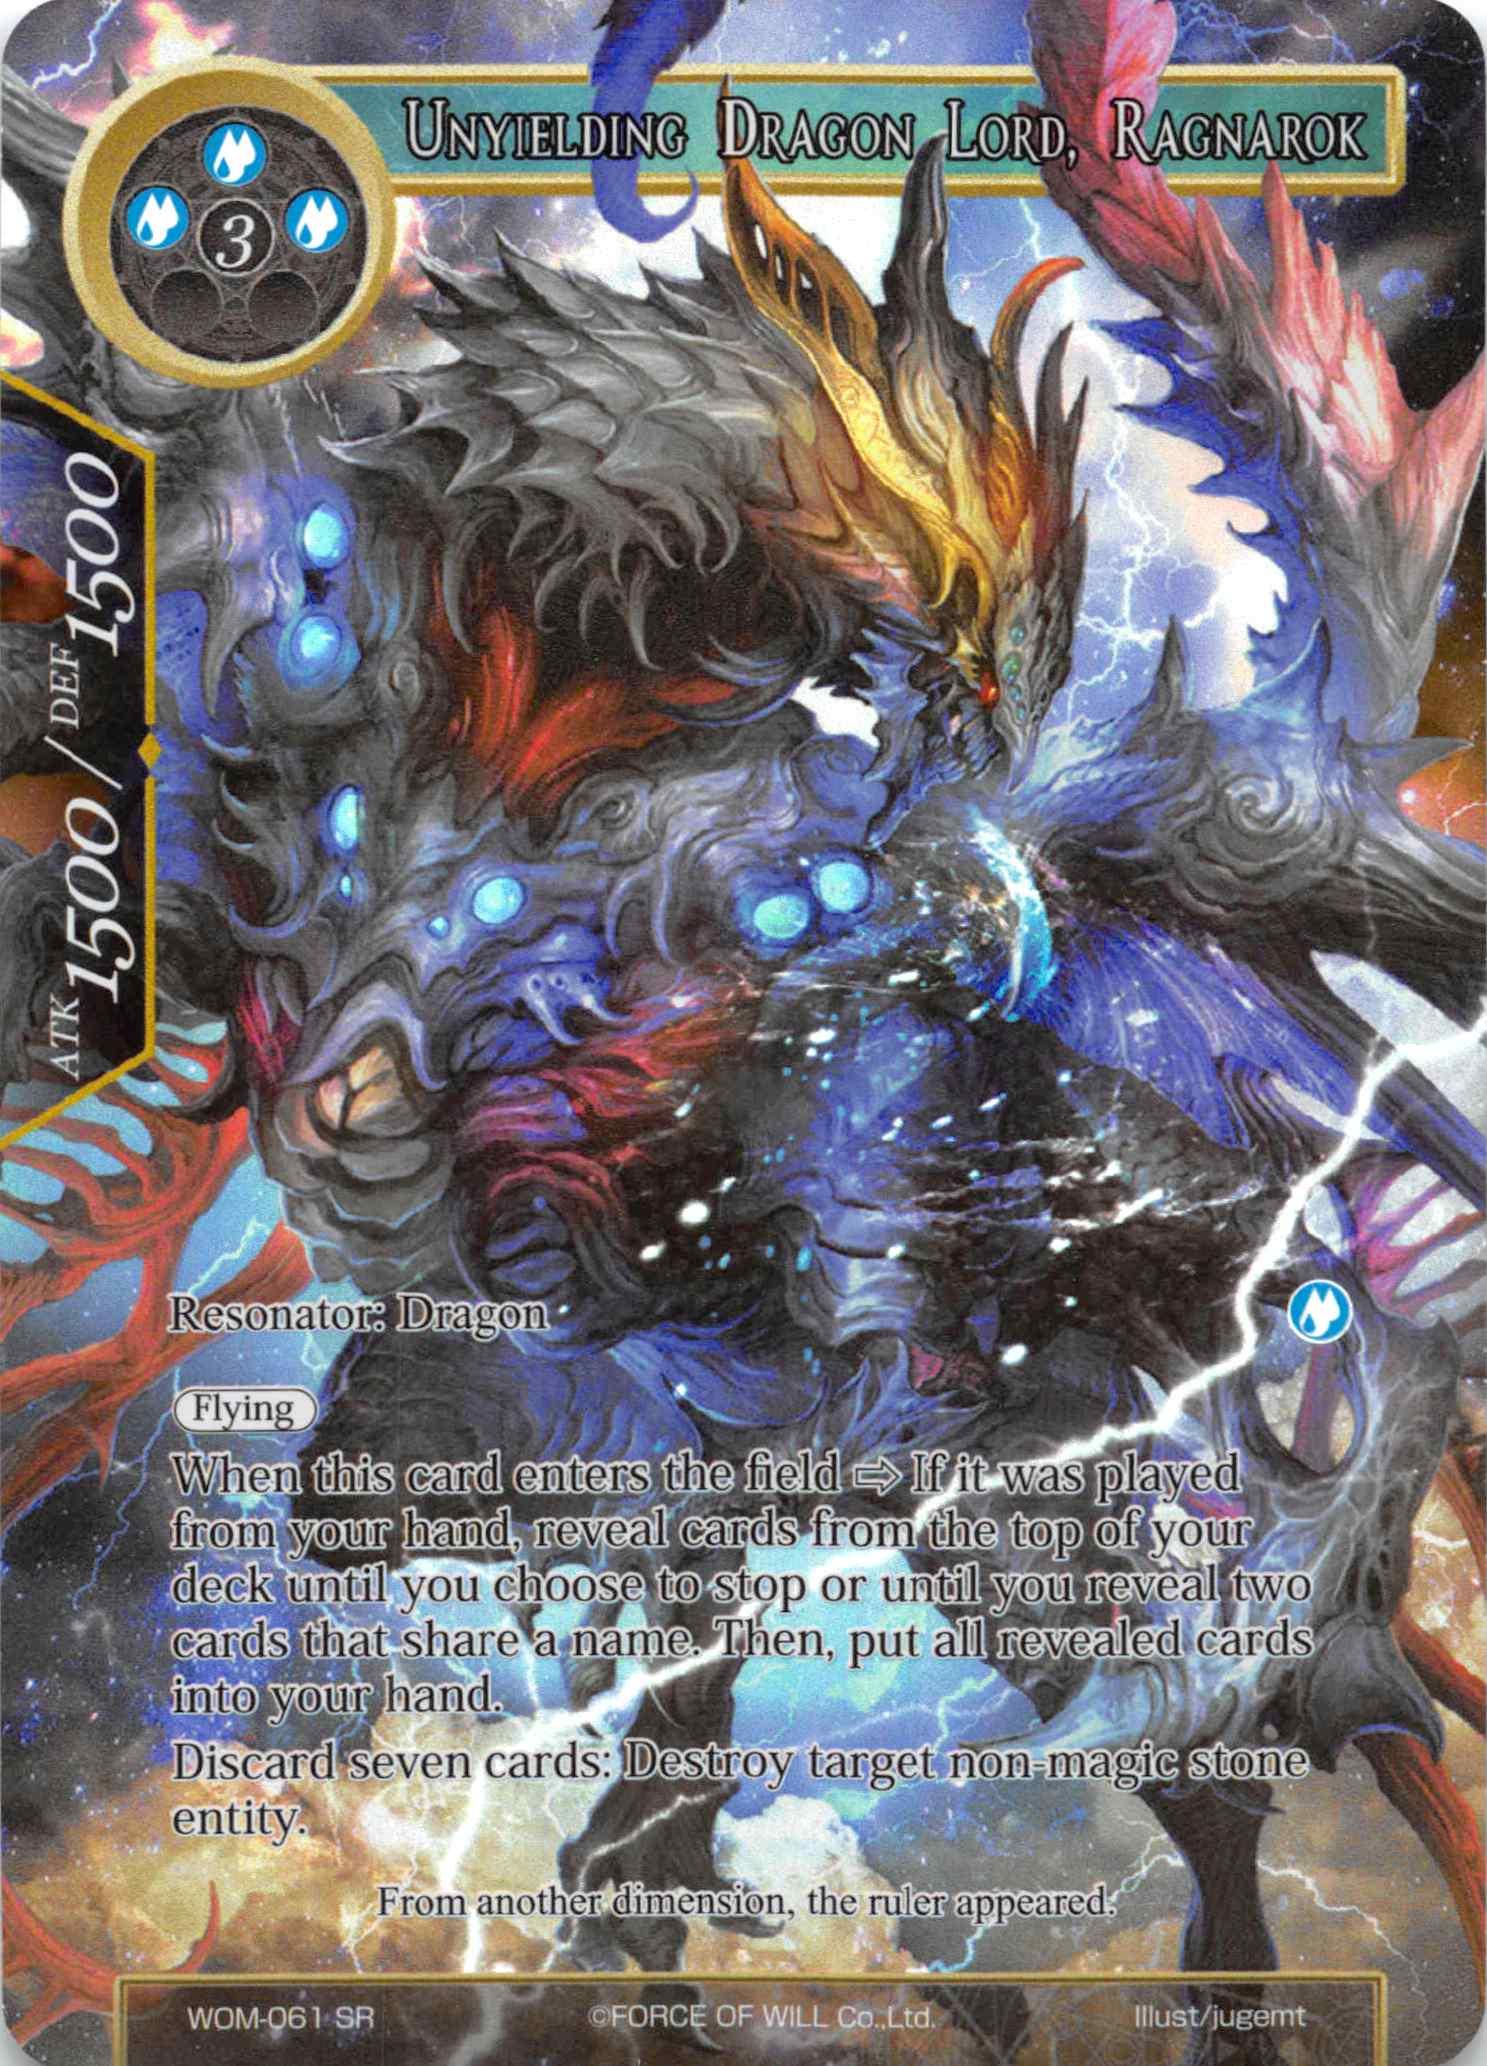 Unyielding Dragon Lord 72175b1219b4